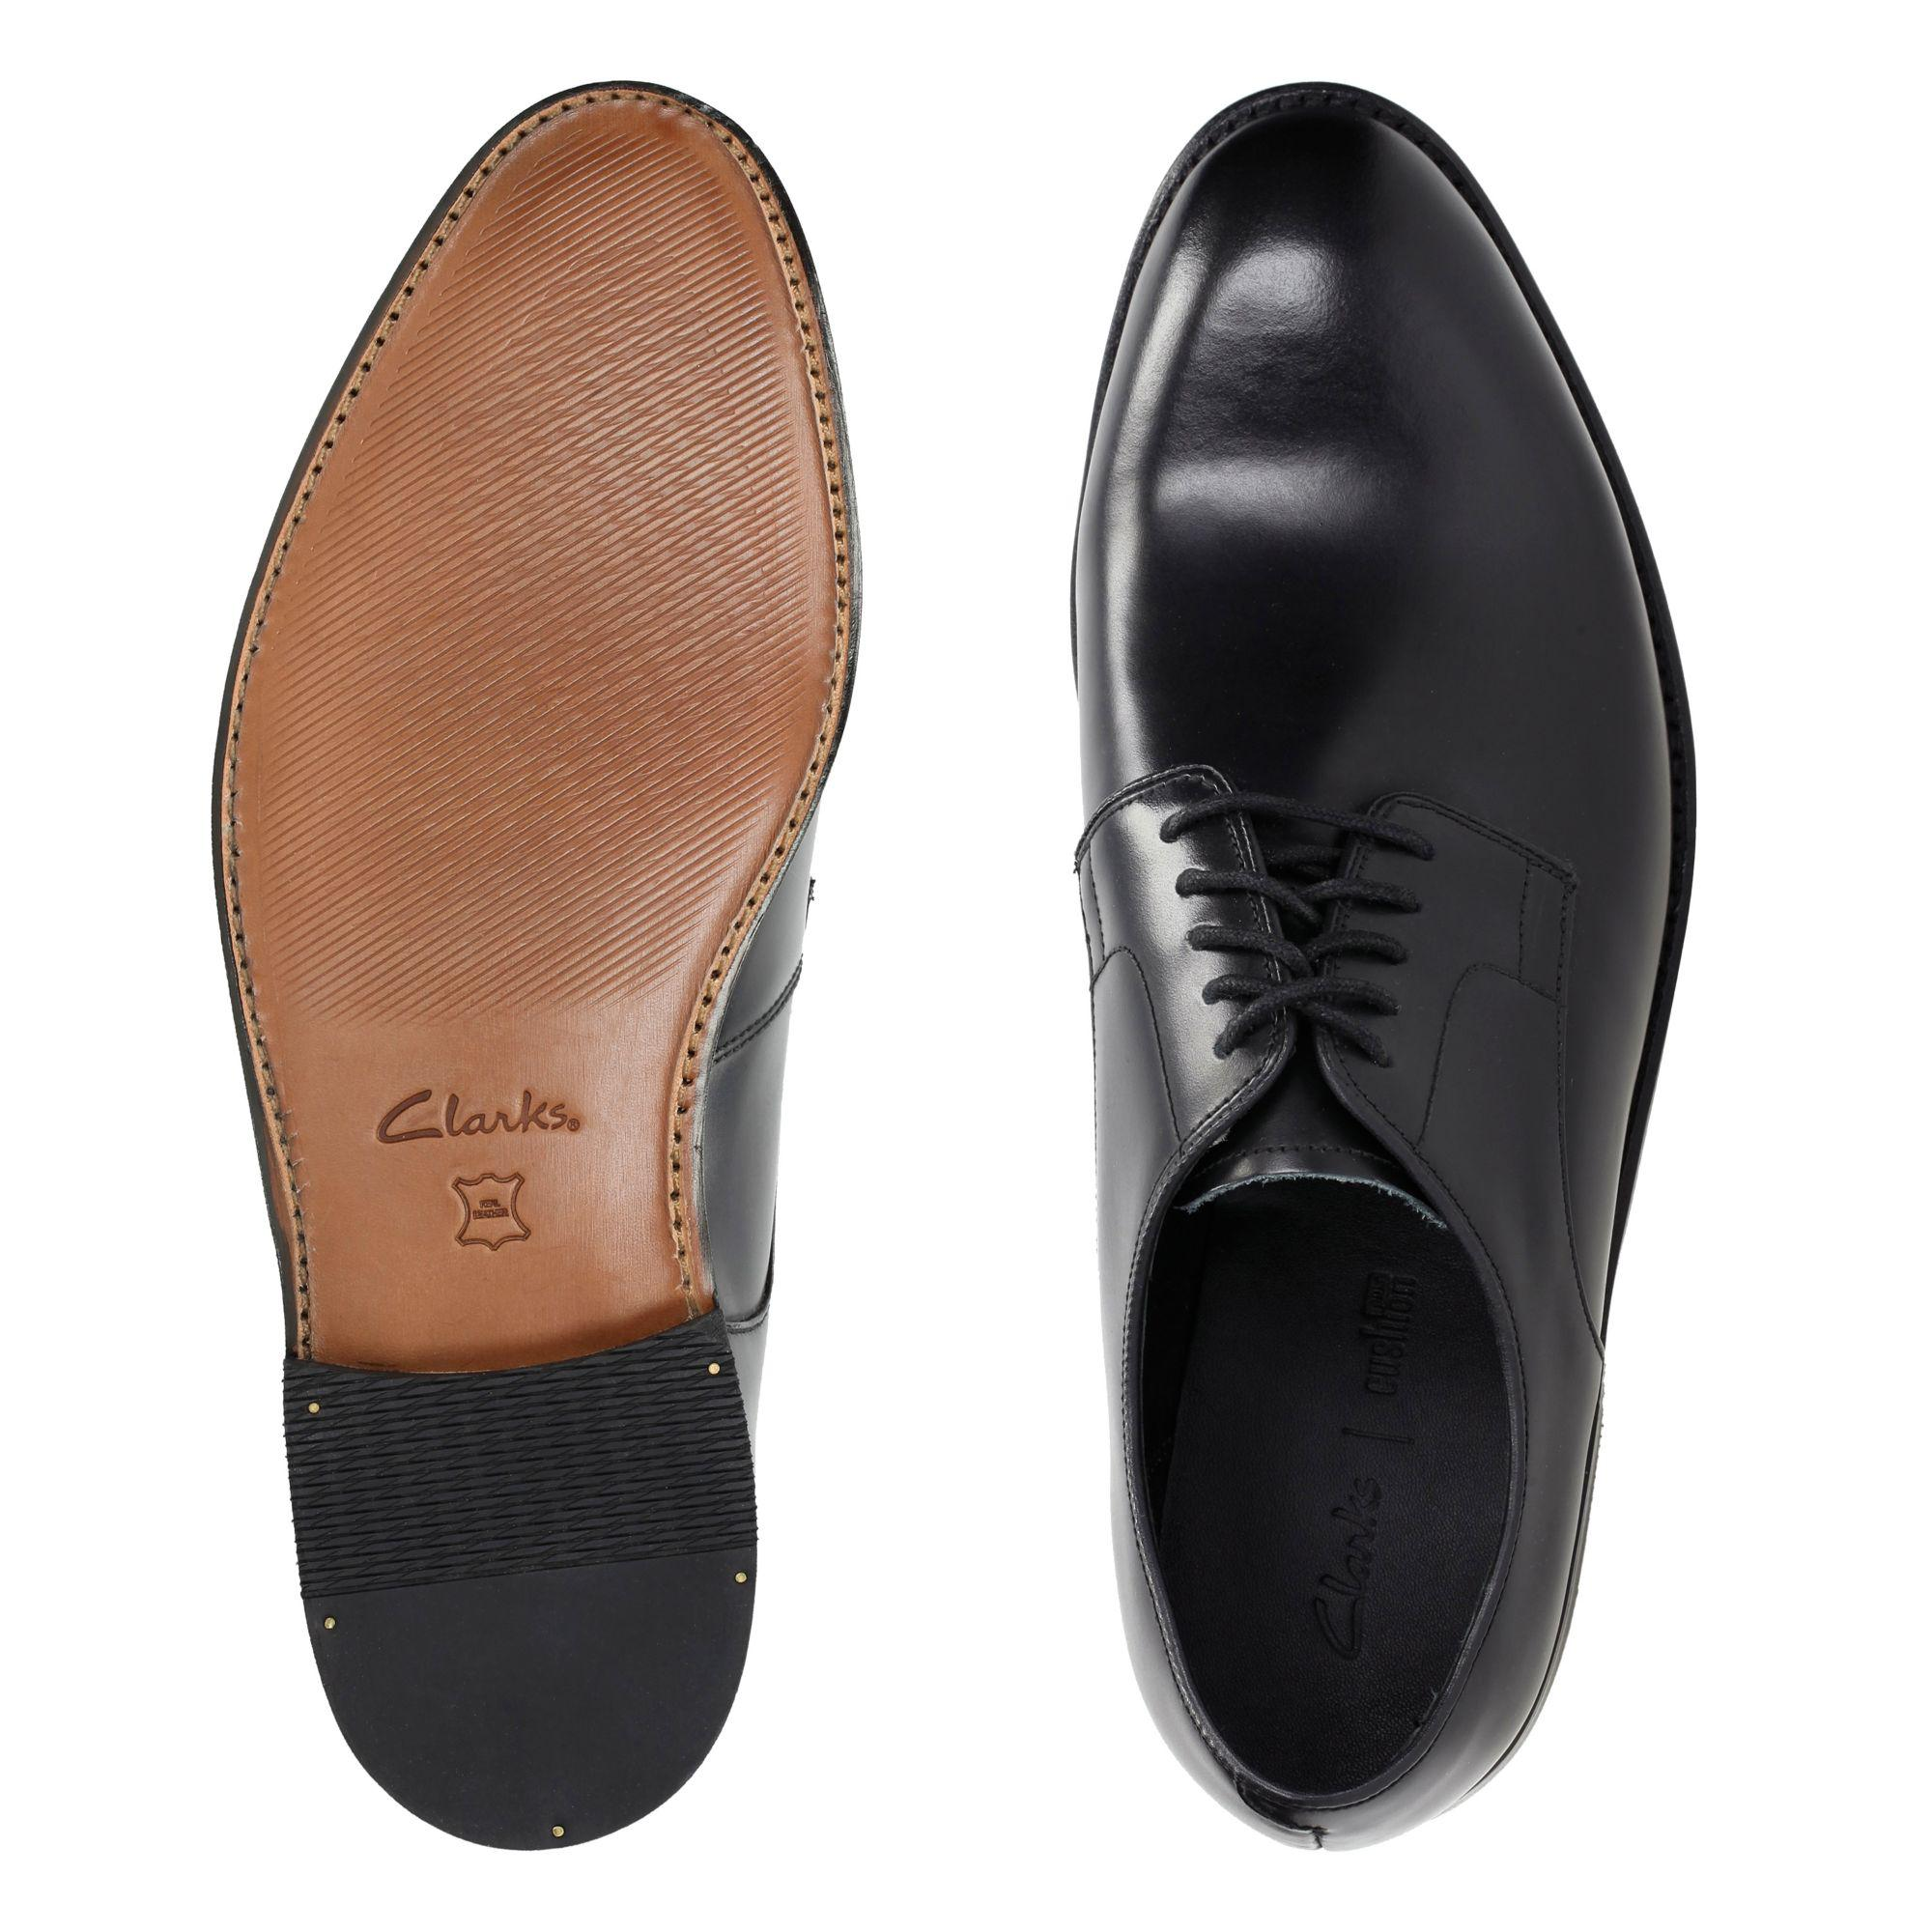 ad2c56551387e Clarks Ellis Leon in Black for Men - Lyst